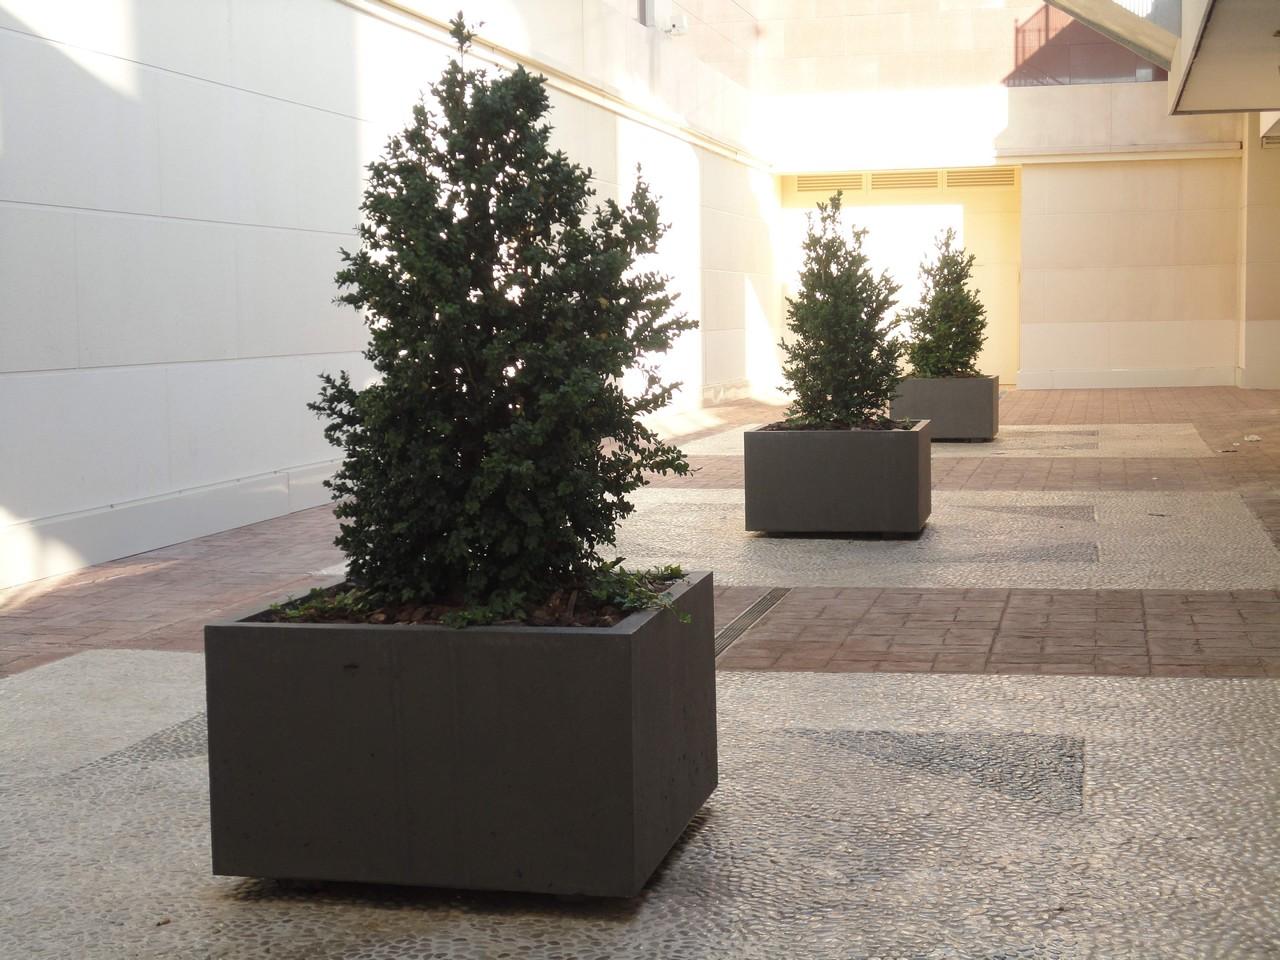 Mobiliario urbano jardineras losada - Maceteros rectangulares grandes ...